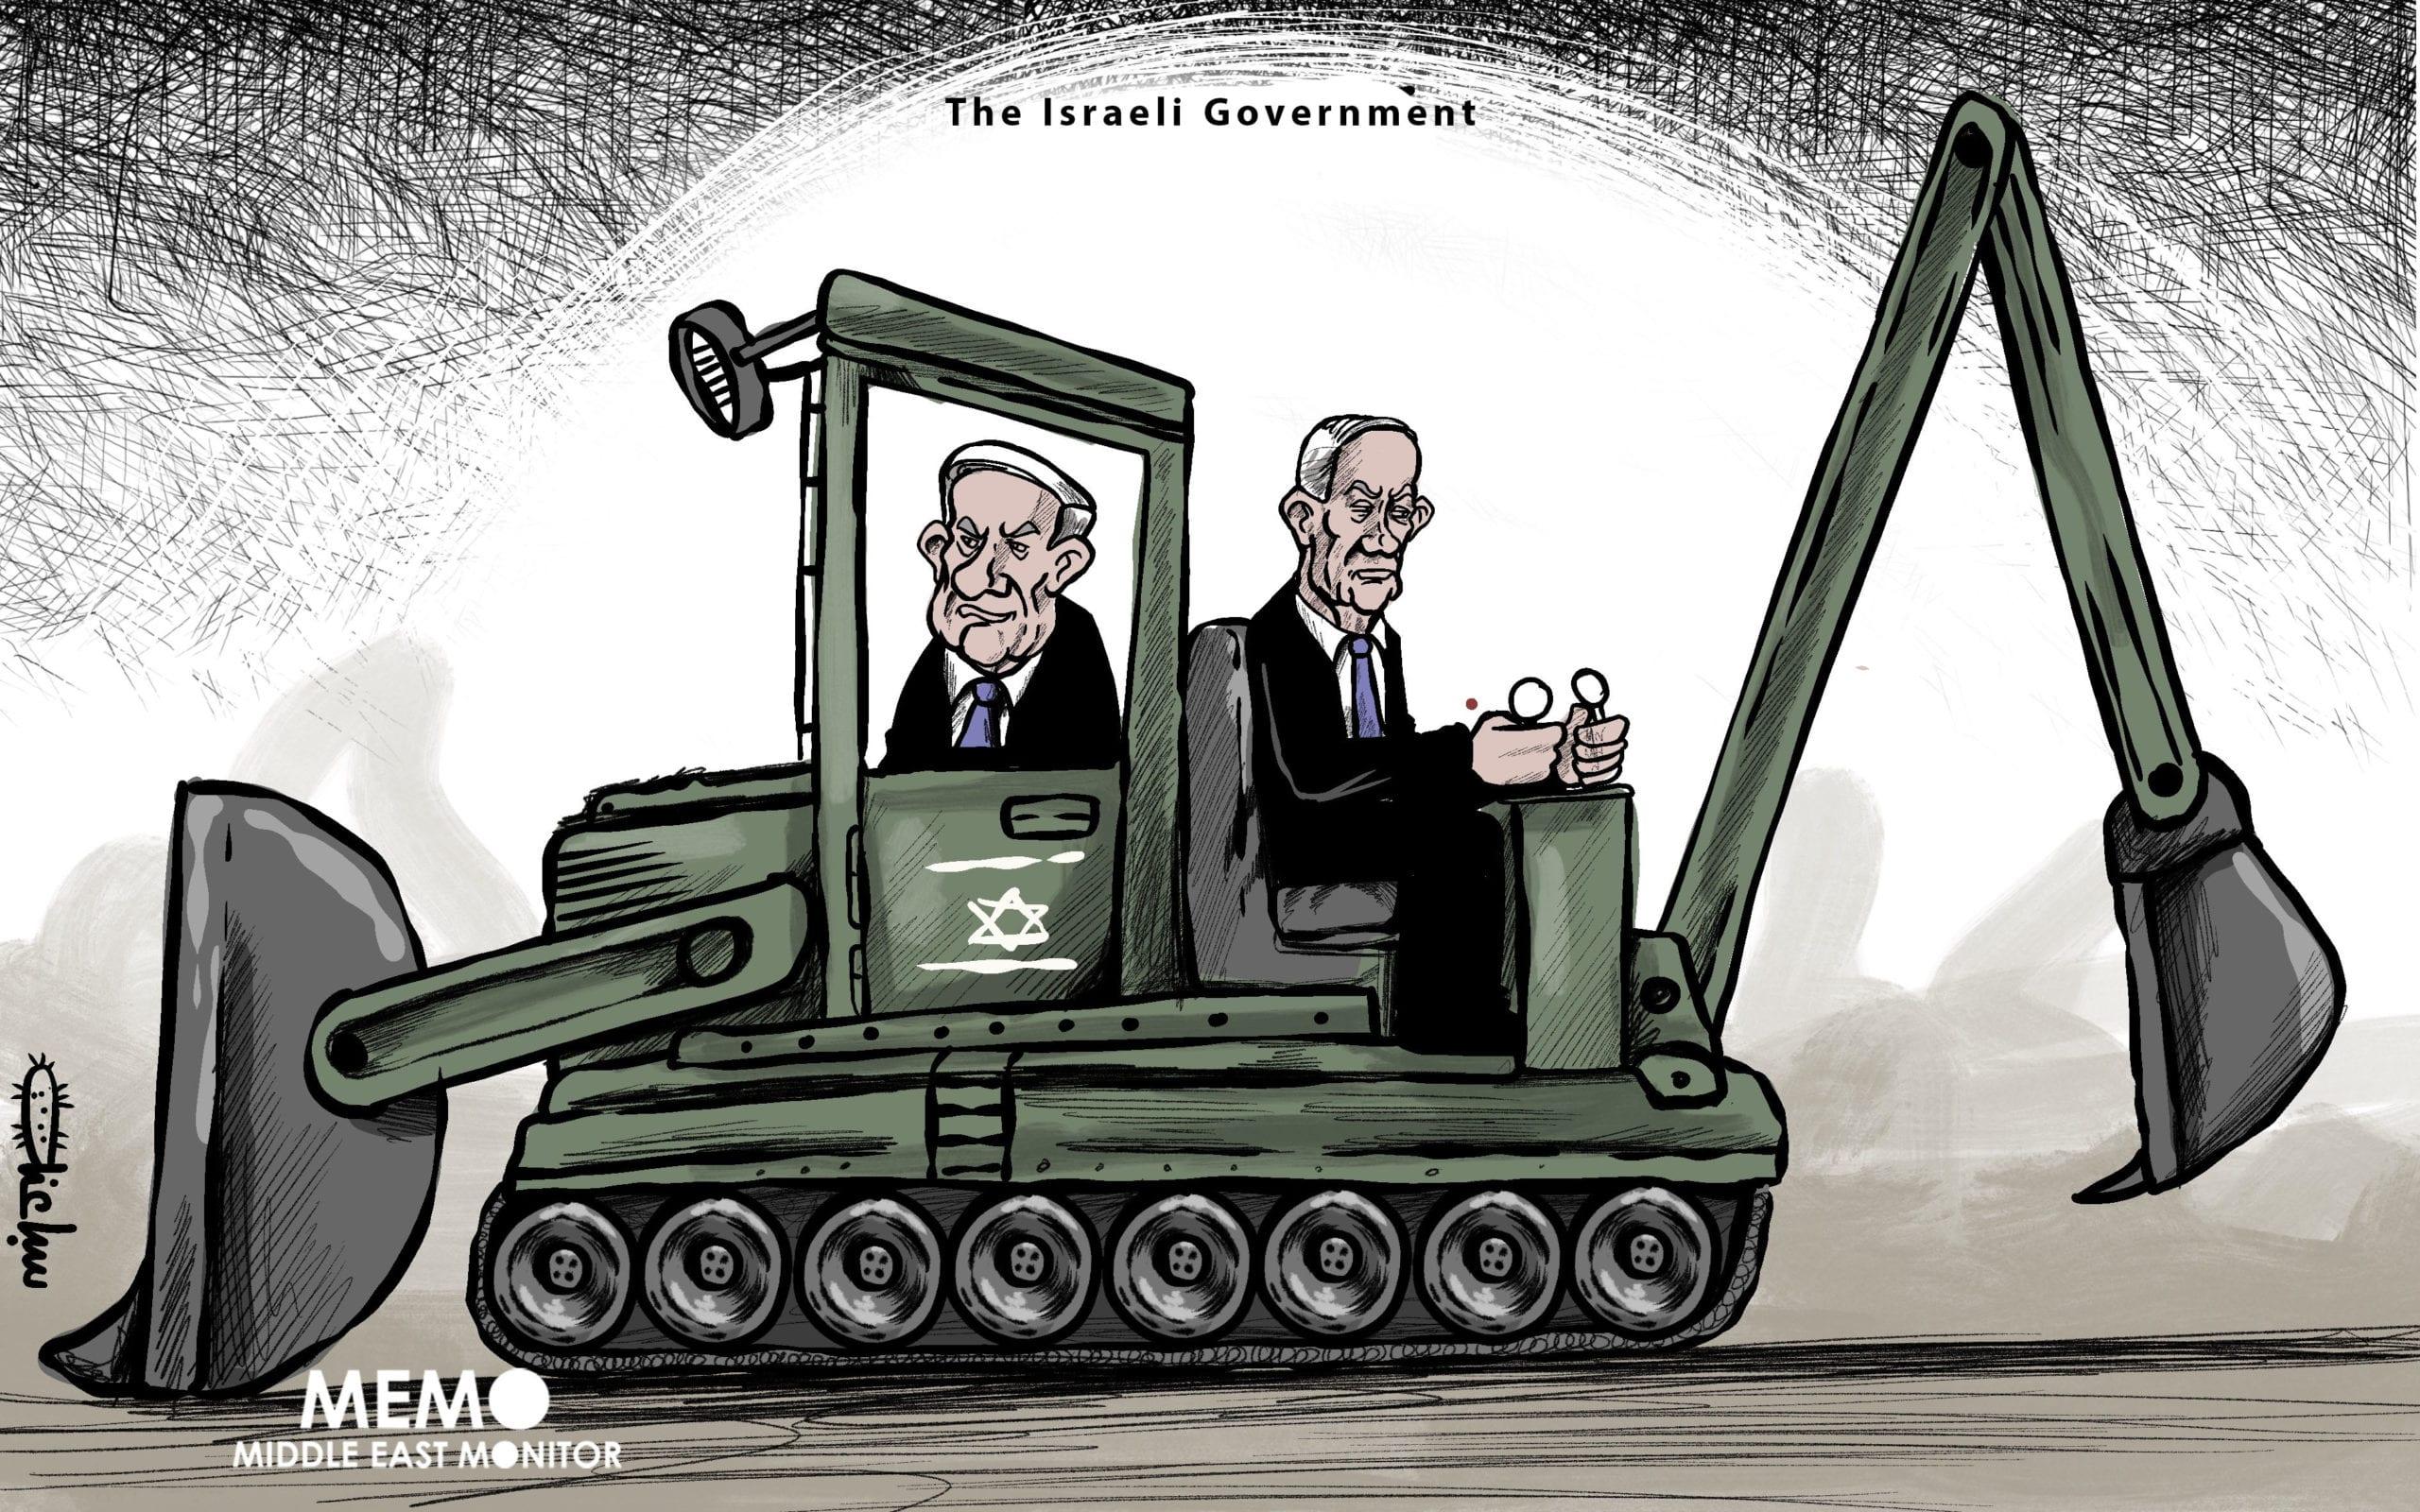 The Israeli government: Netanyahu-Gantz coalition - Cartoon [Sabaaneh/MiddleEastMonitor]